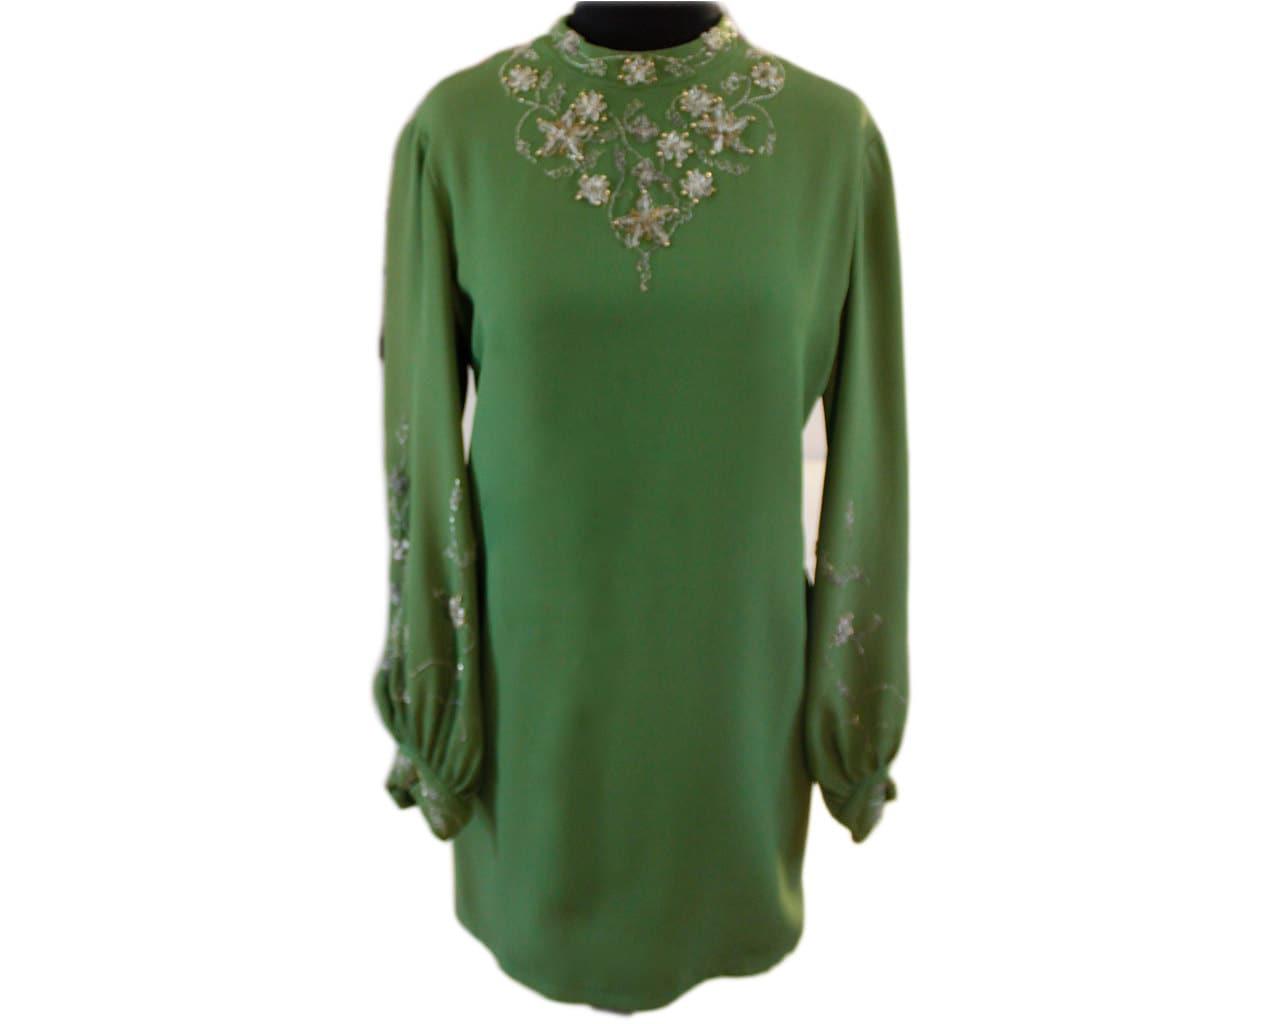 Vintage Kelly Green Beaded MiniDress Shirt Dress